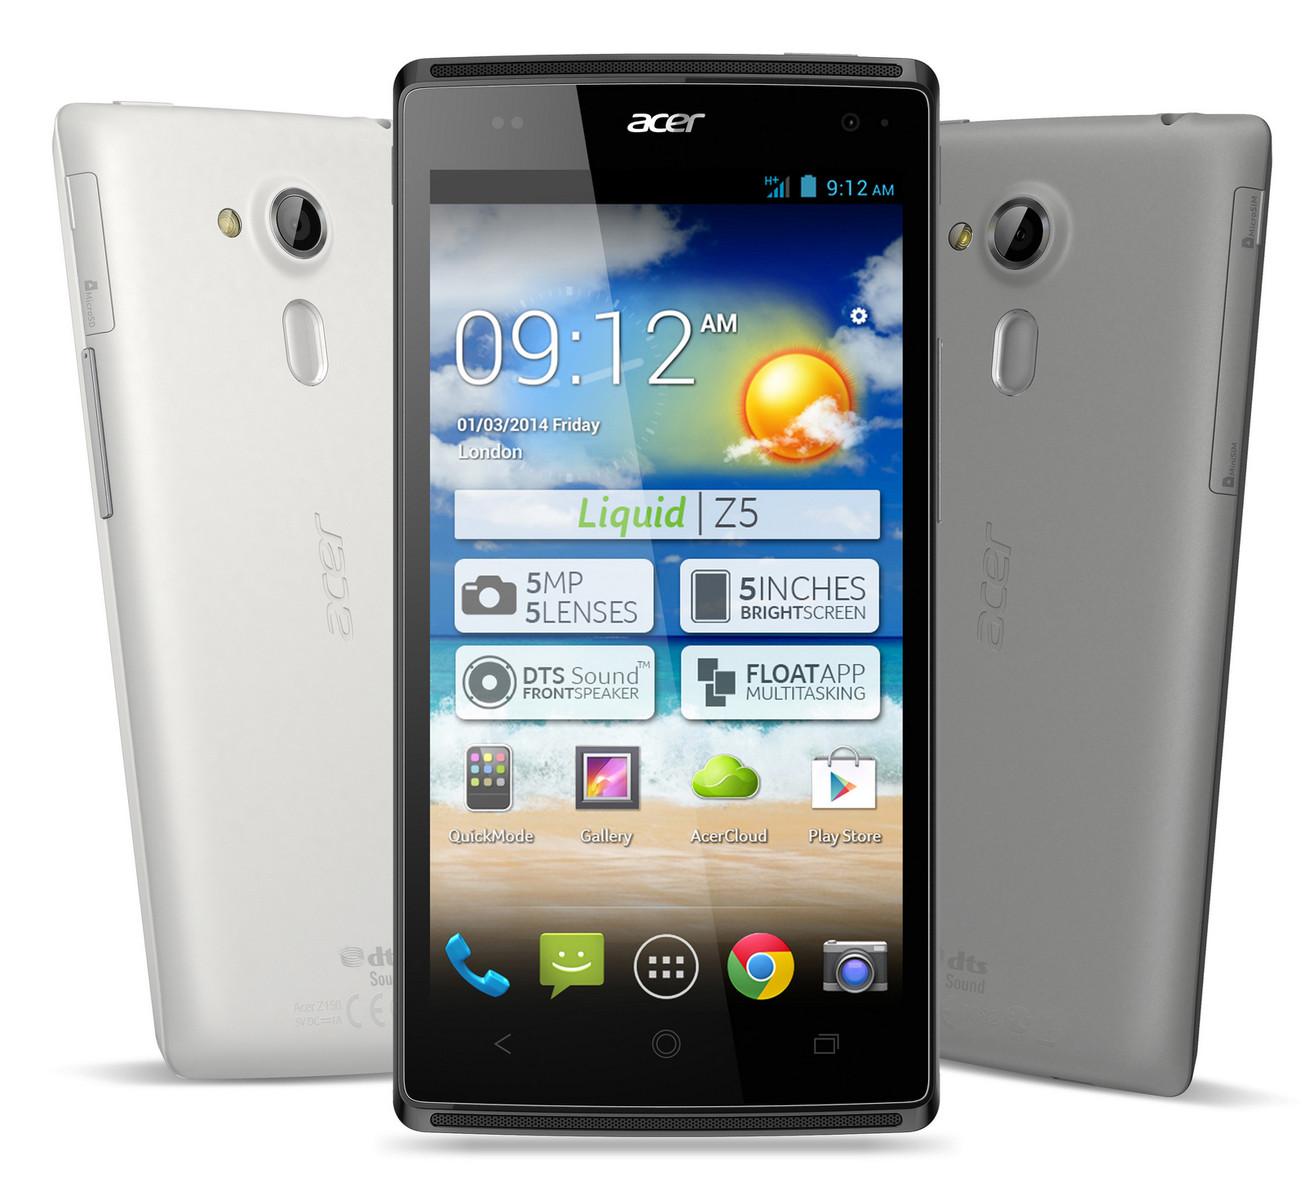 Acer Z5 Liquid